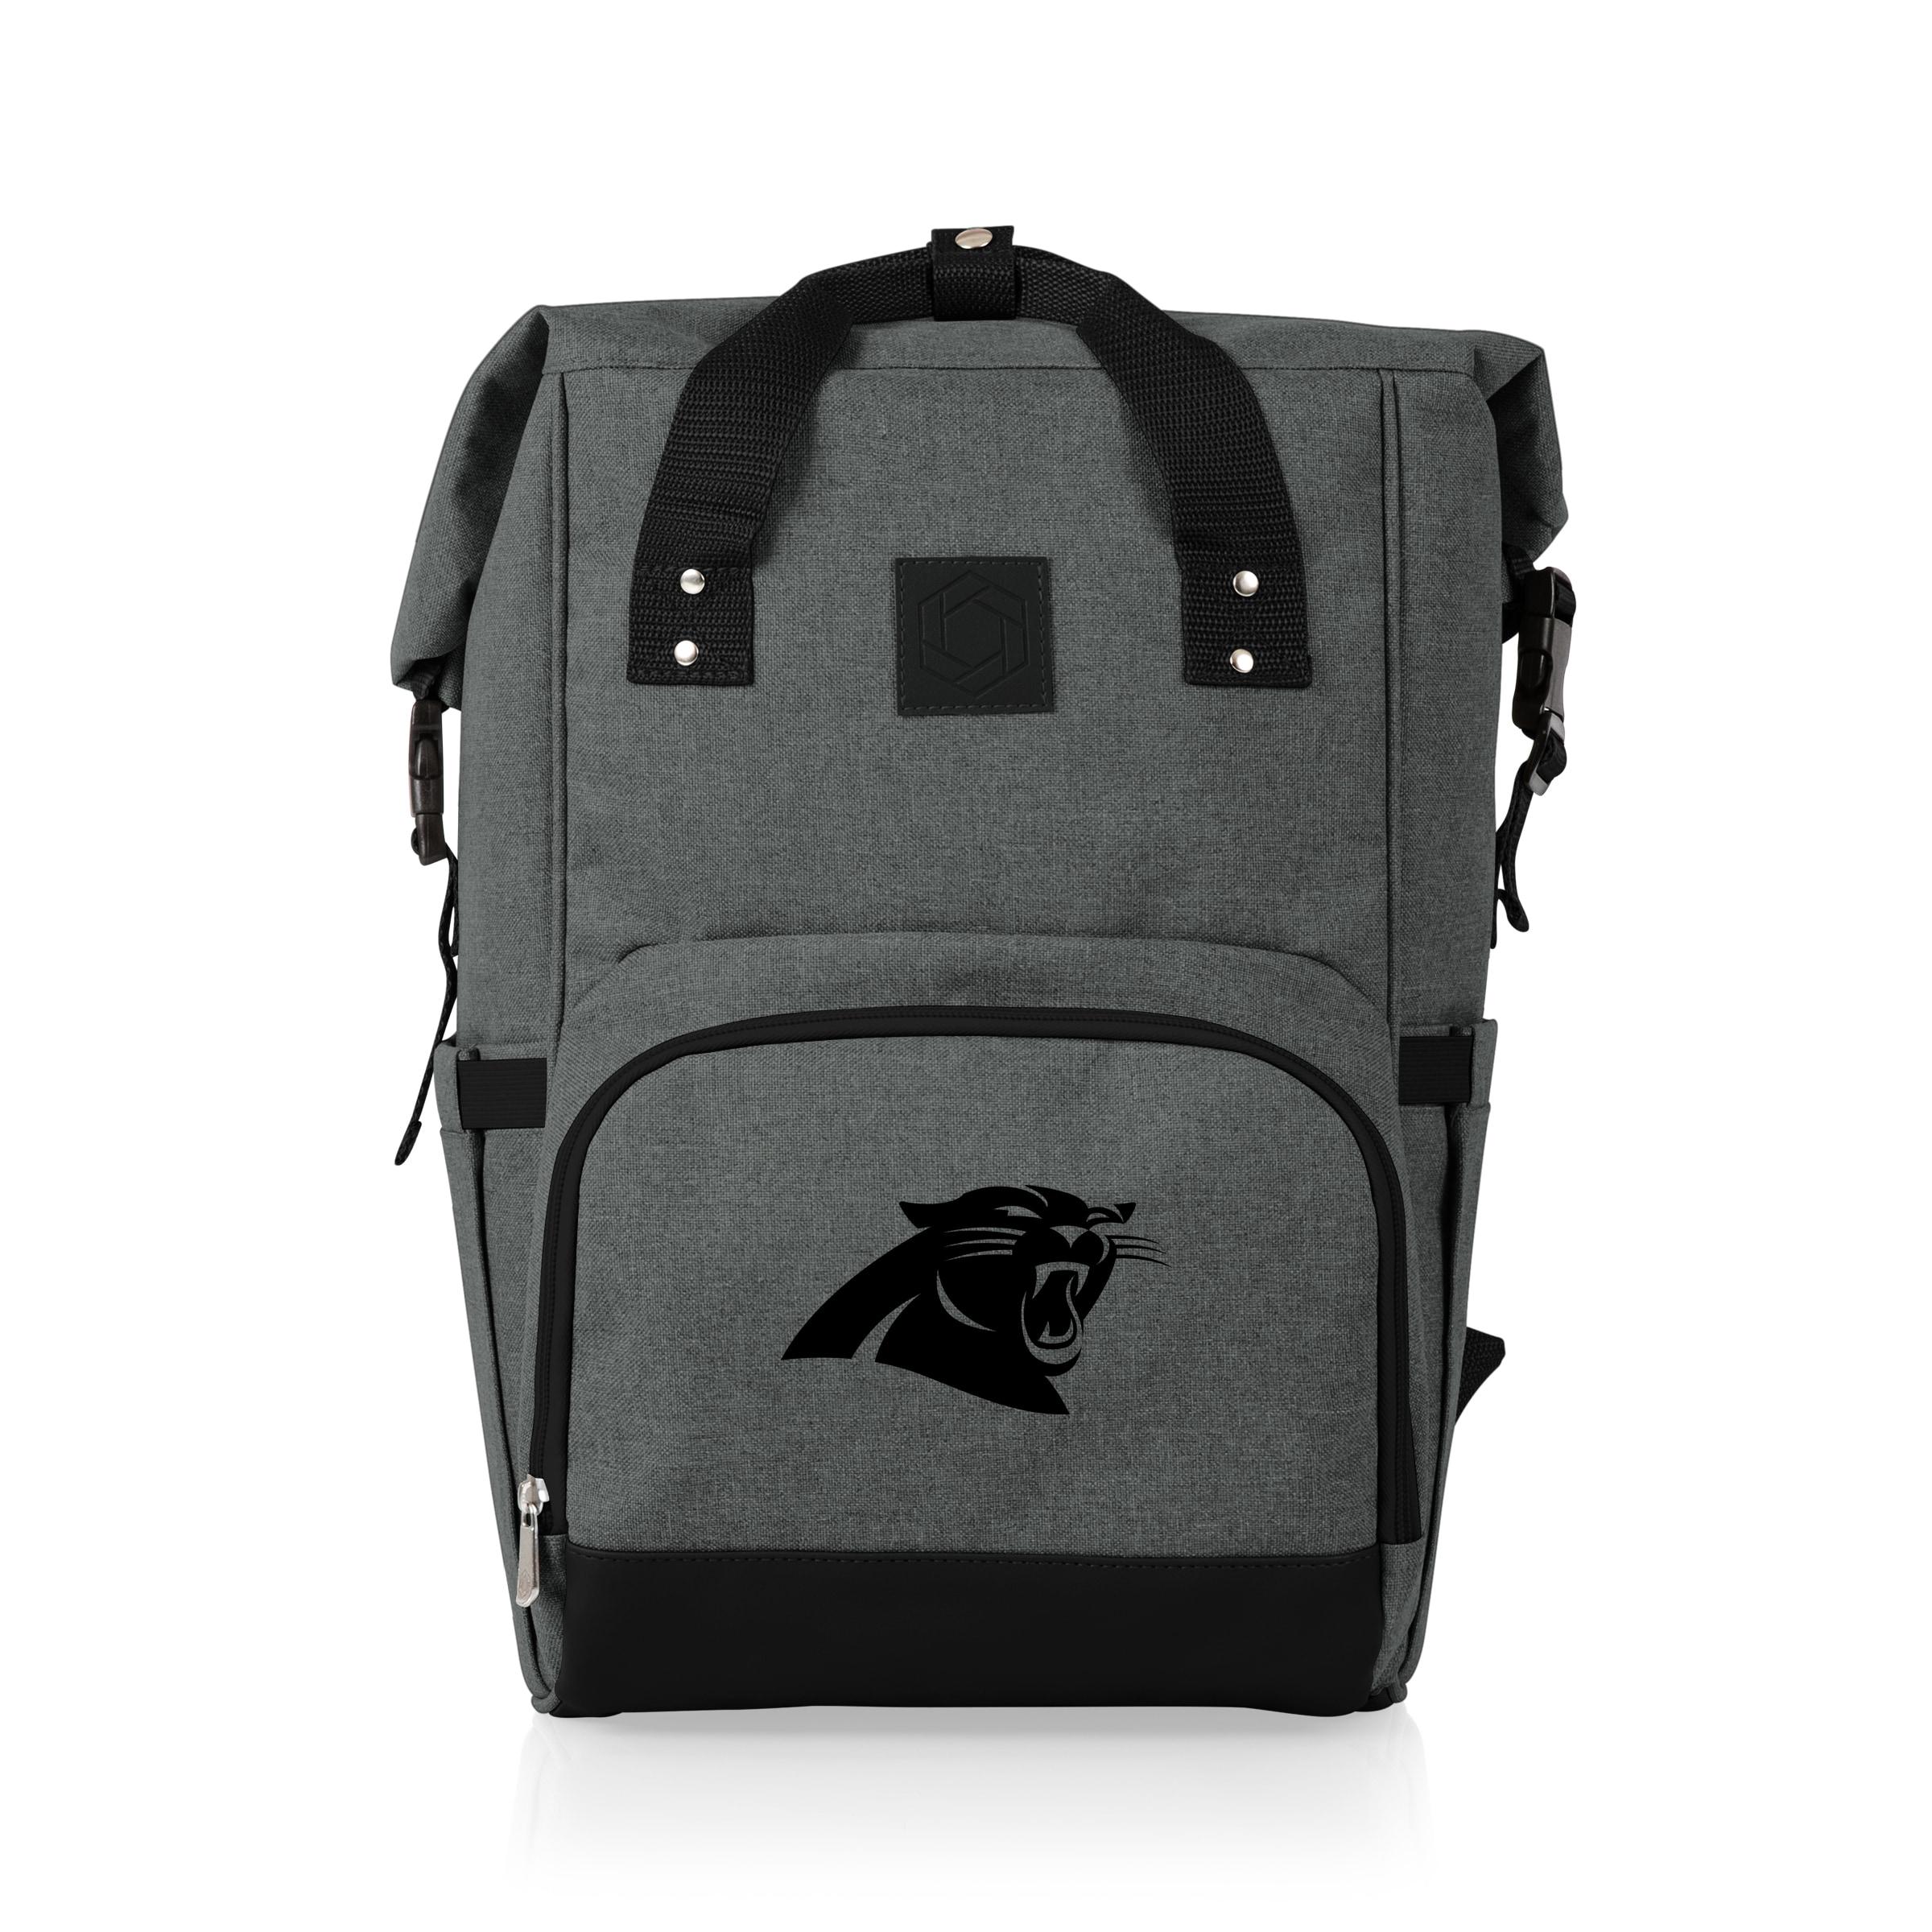 Carolina Panthers Backpack - Gray